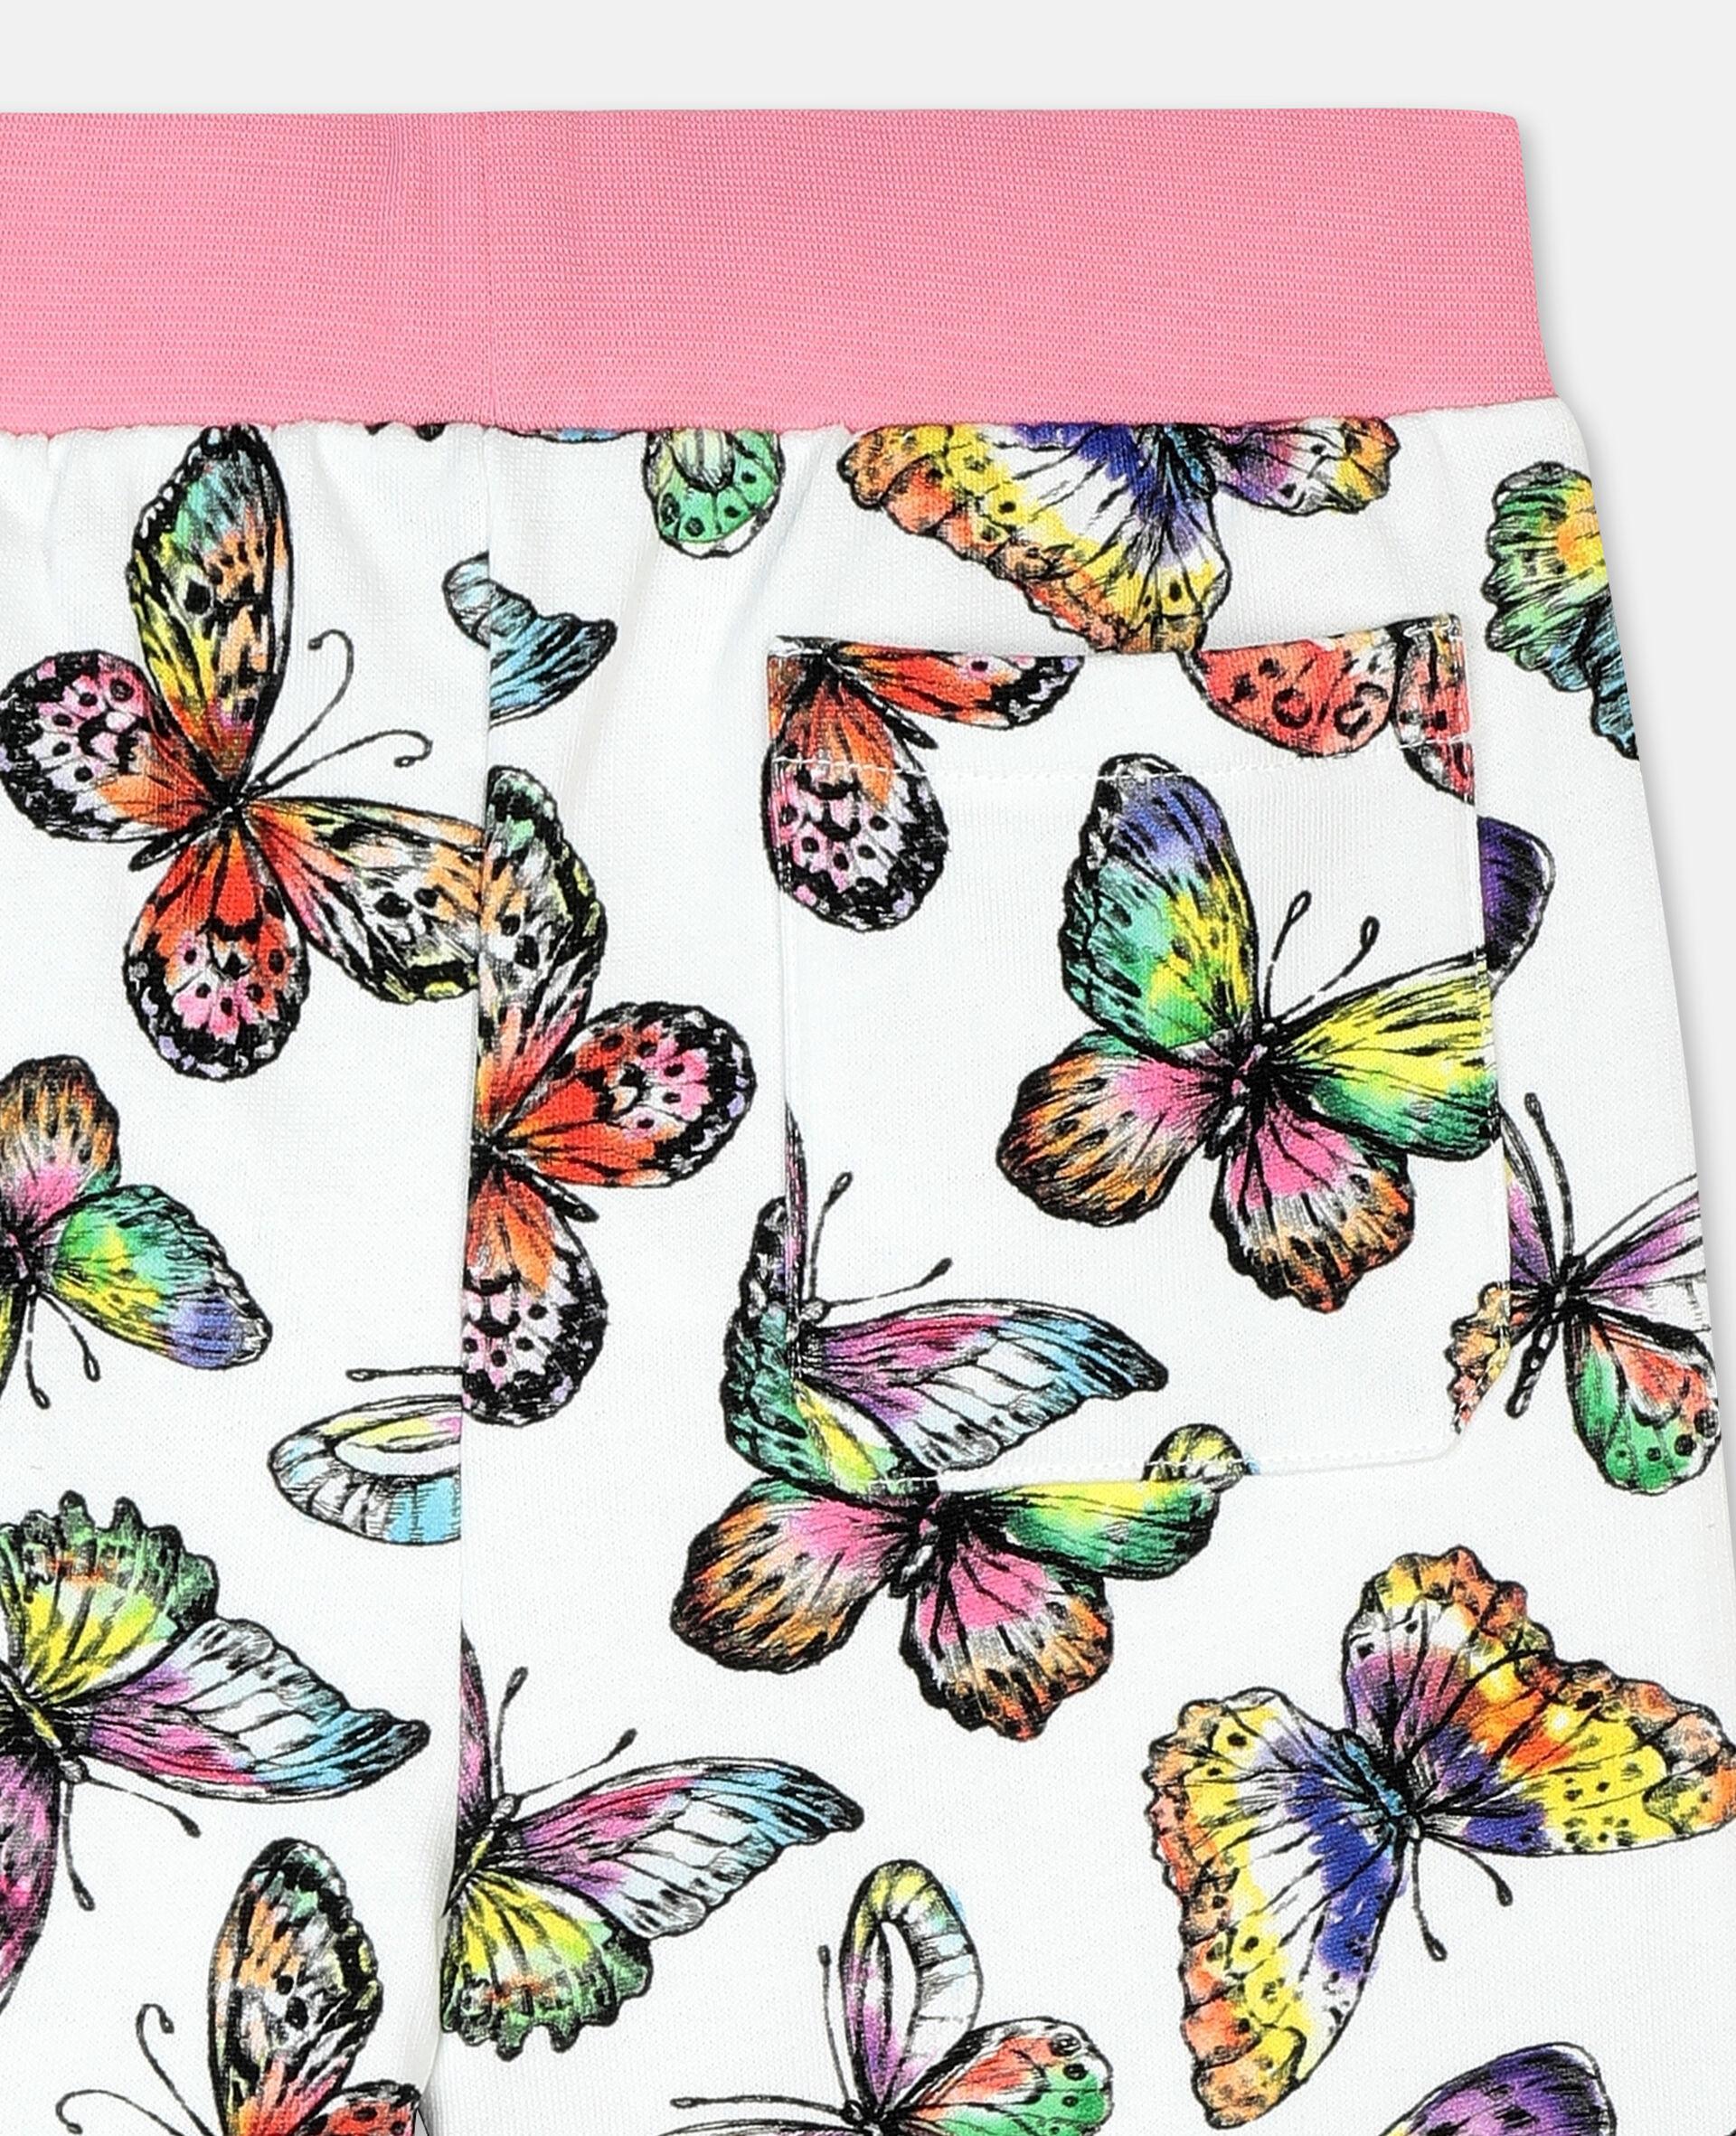 Butterfly棉质抓绒运动裤 -Multicolored-large image number 2